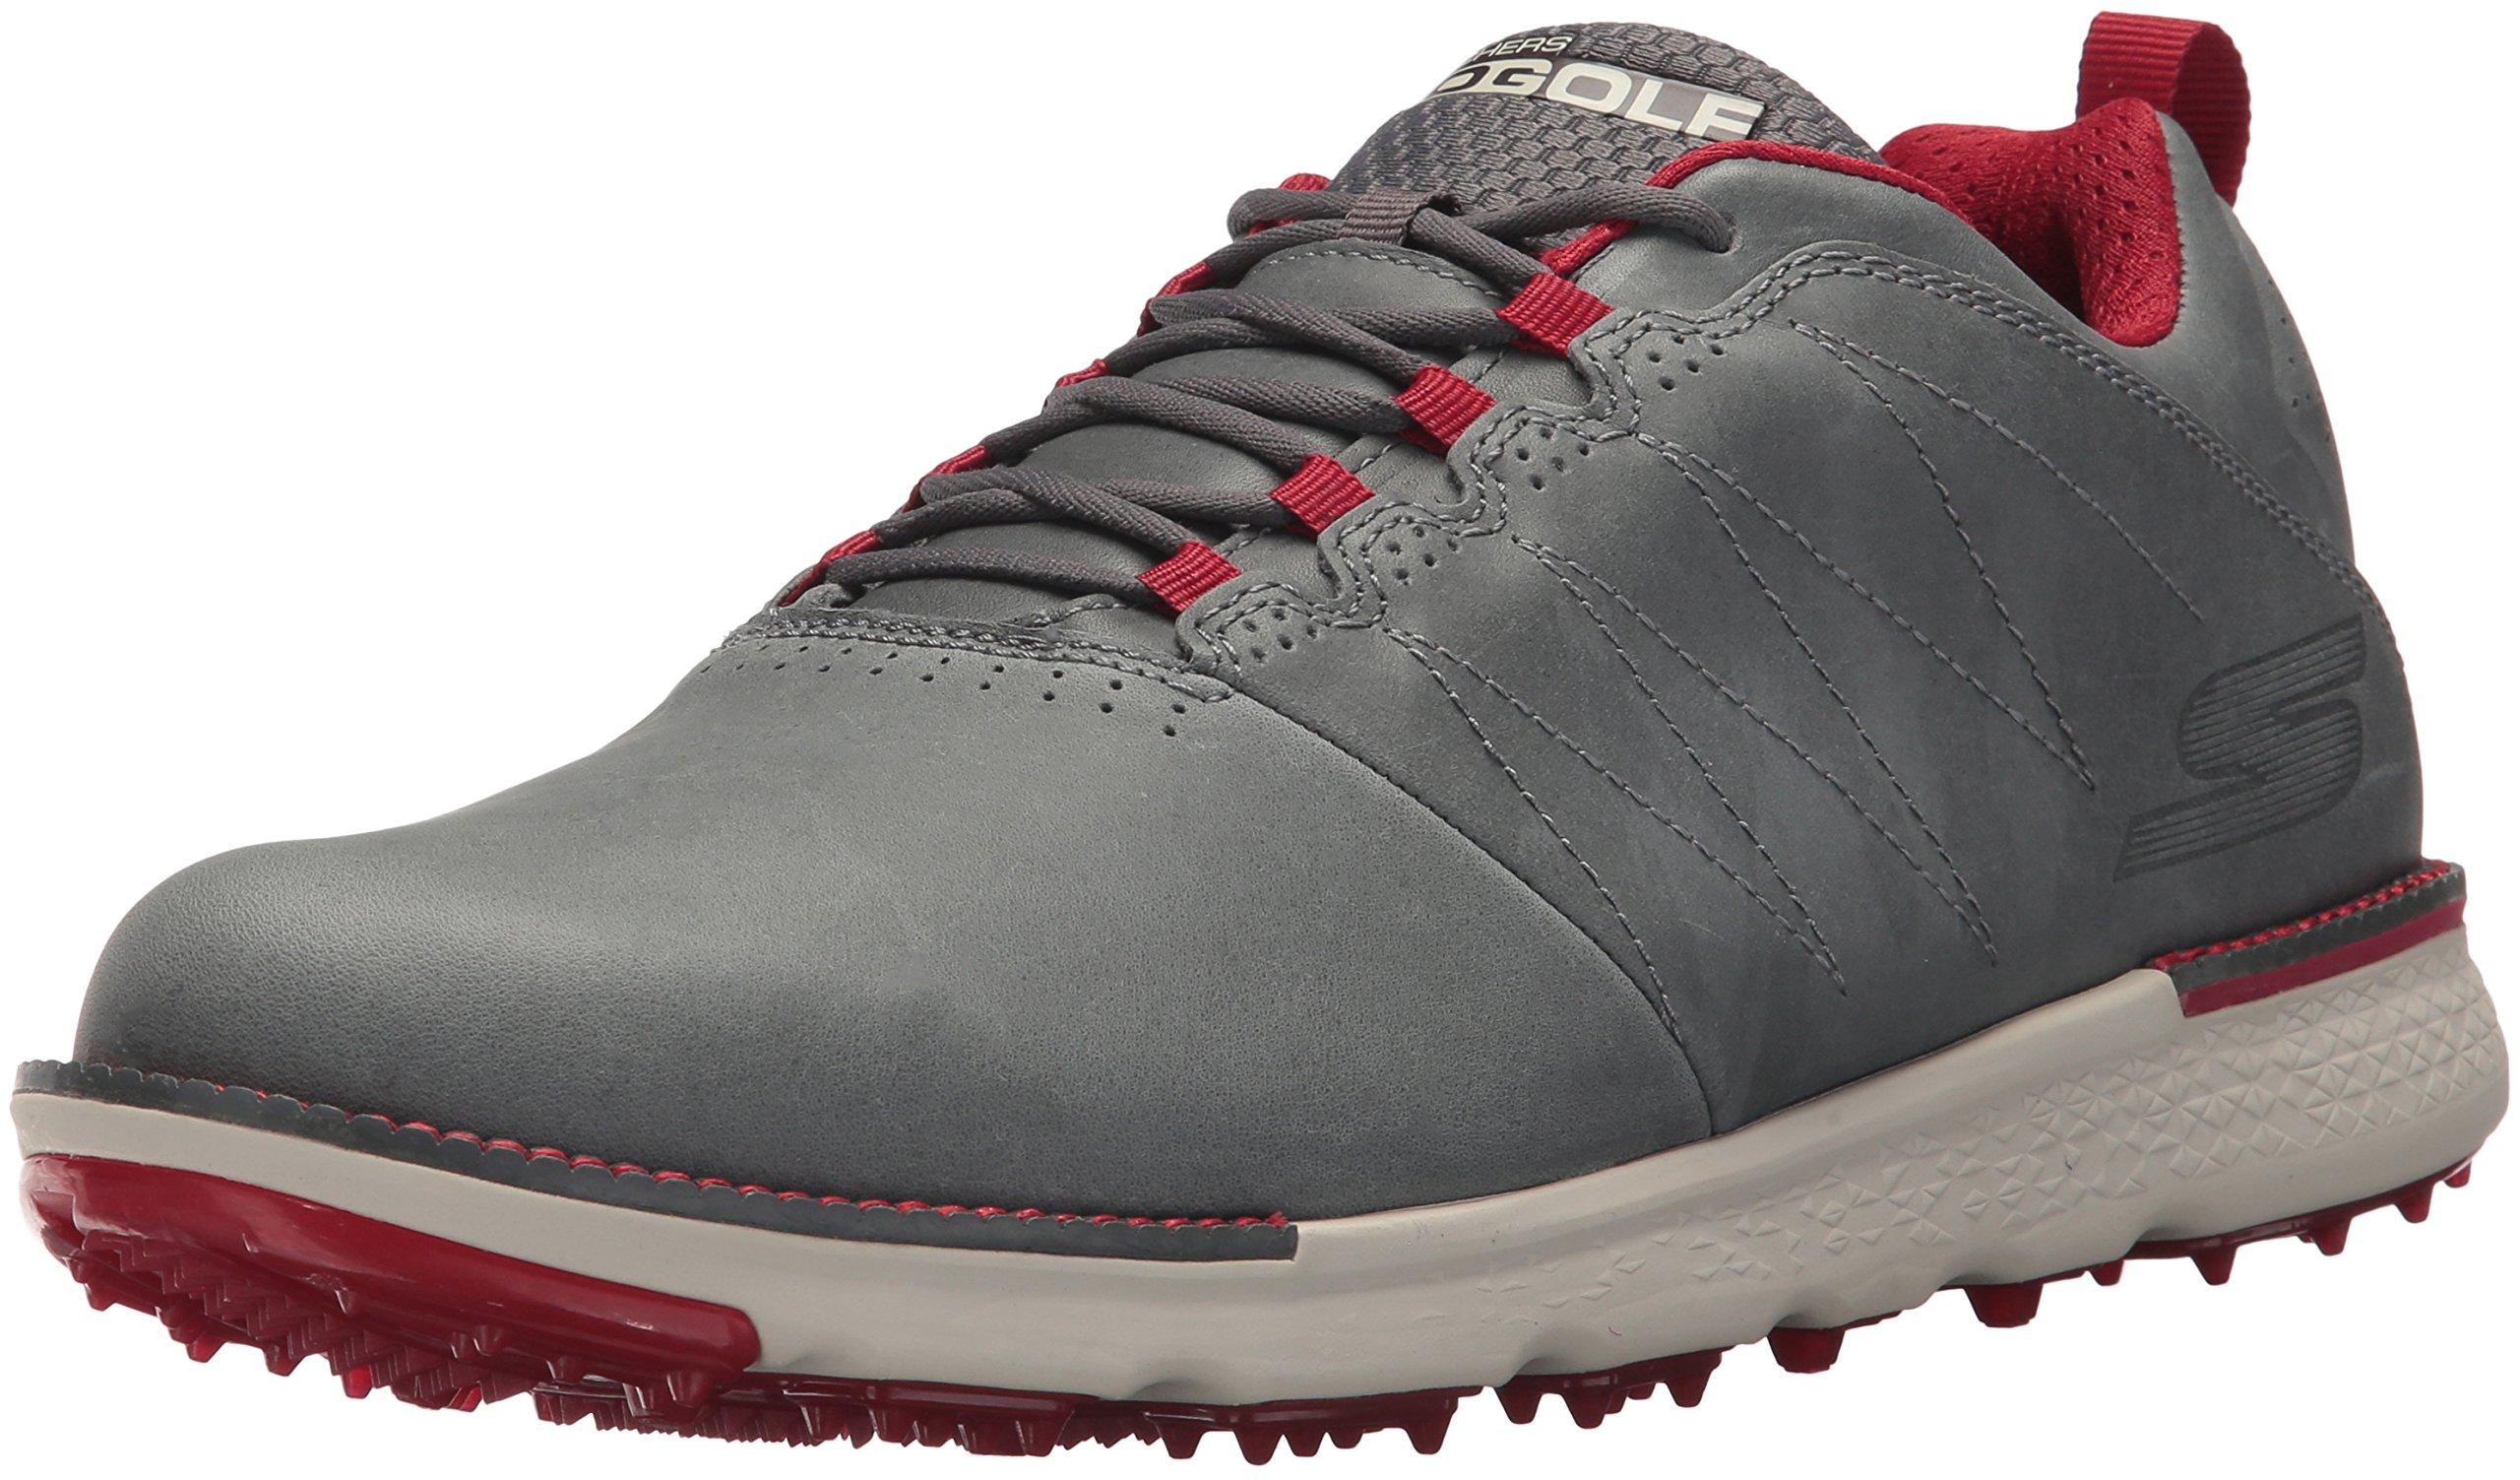 Skechers Men's Go Elite 3 LX Wide Golf Shoe,charcoal/red,7.5 W US